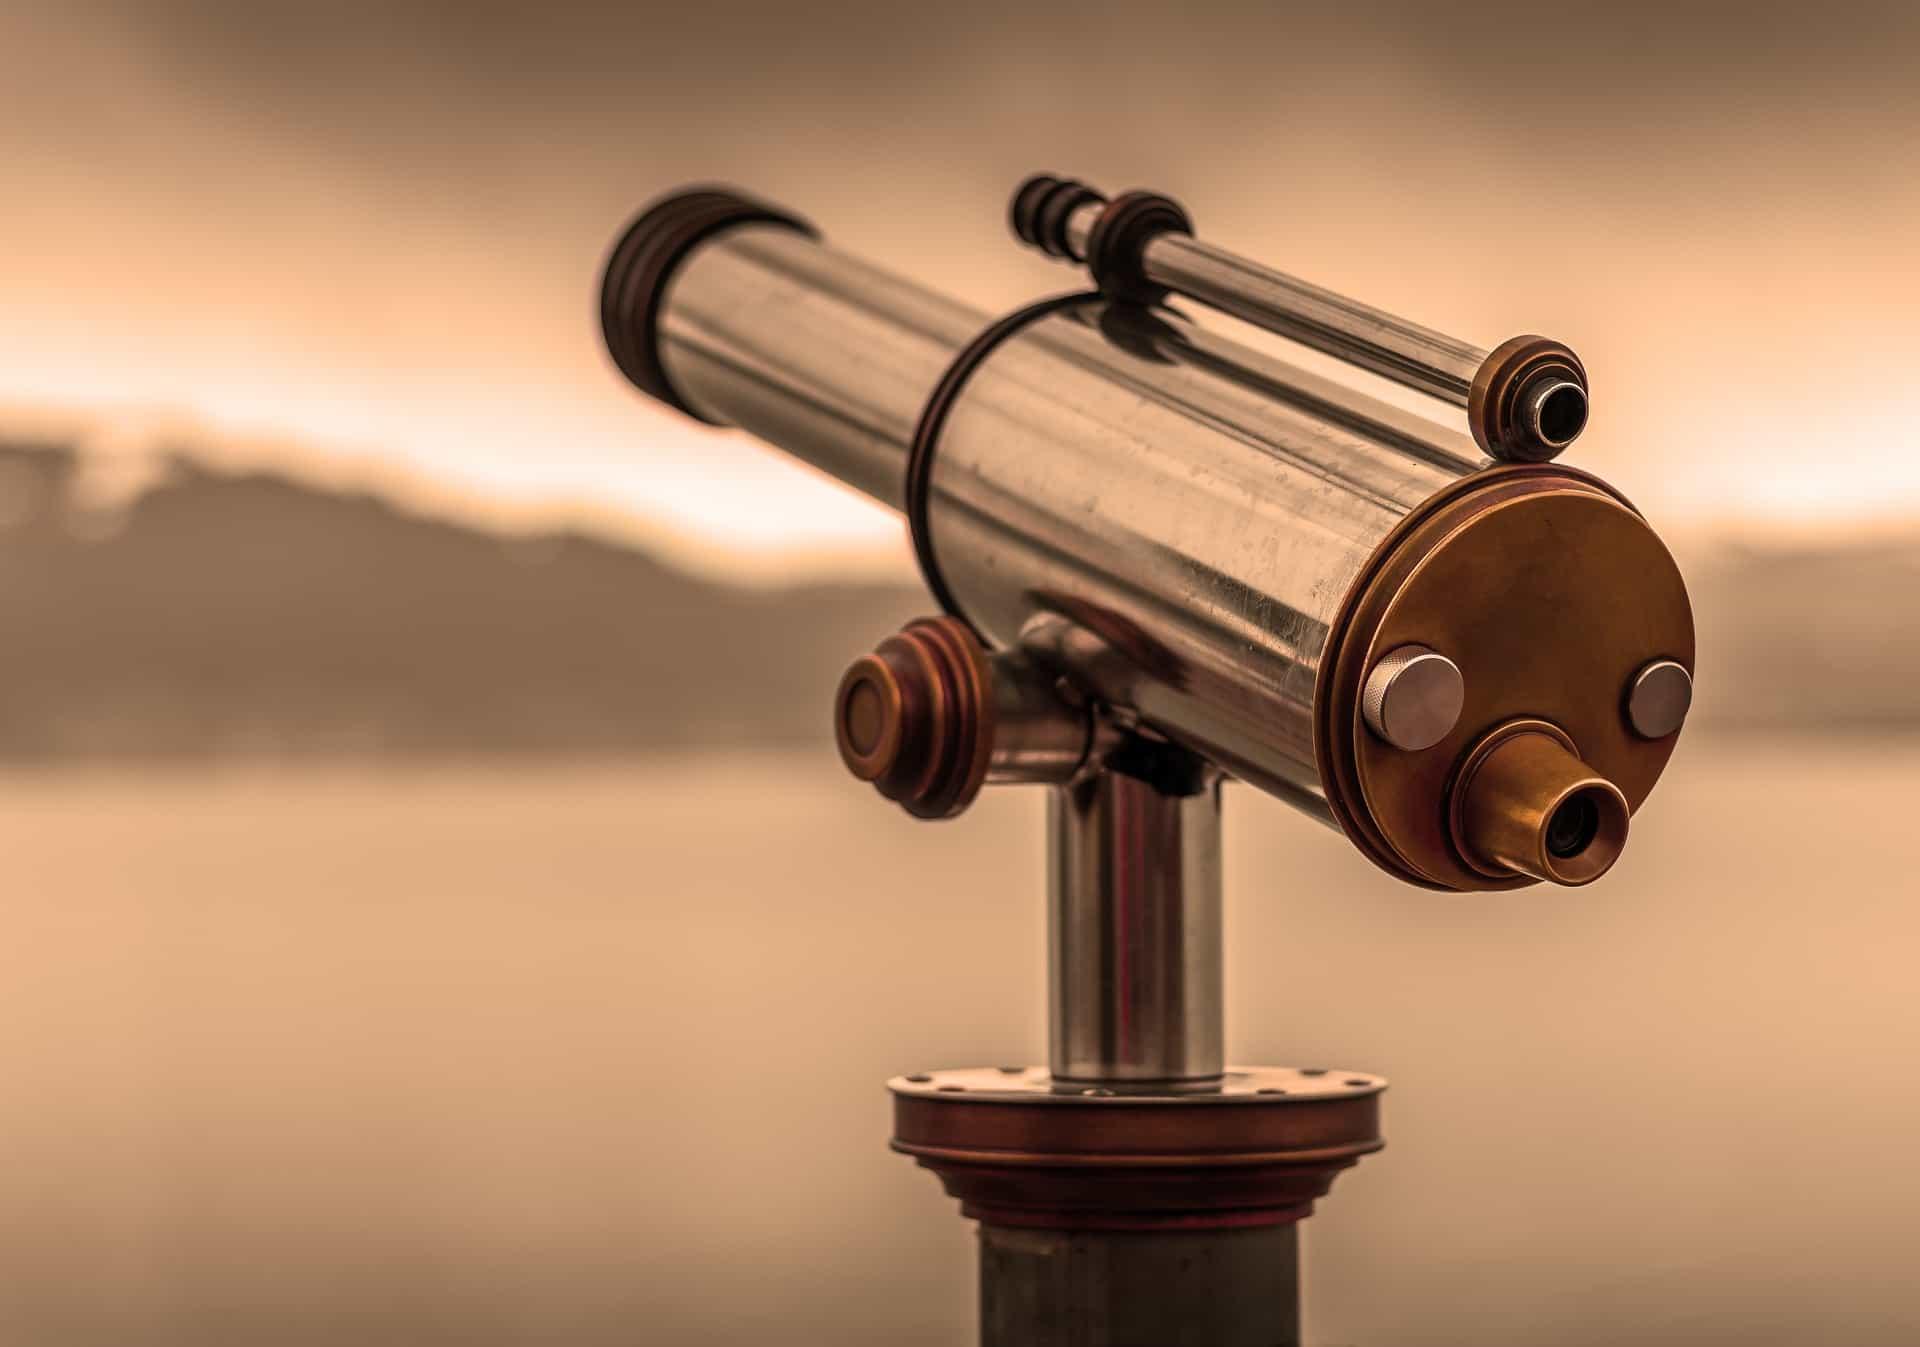 simple to use telescope